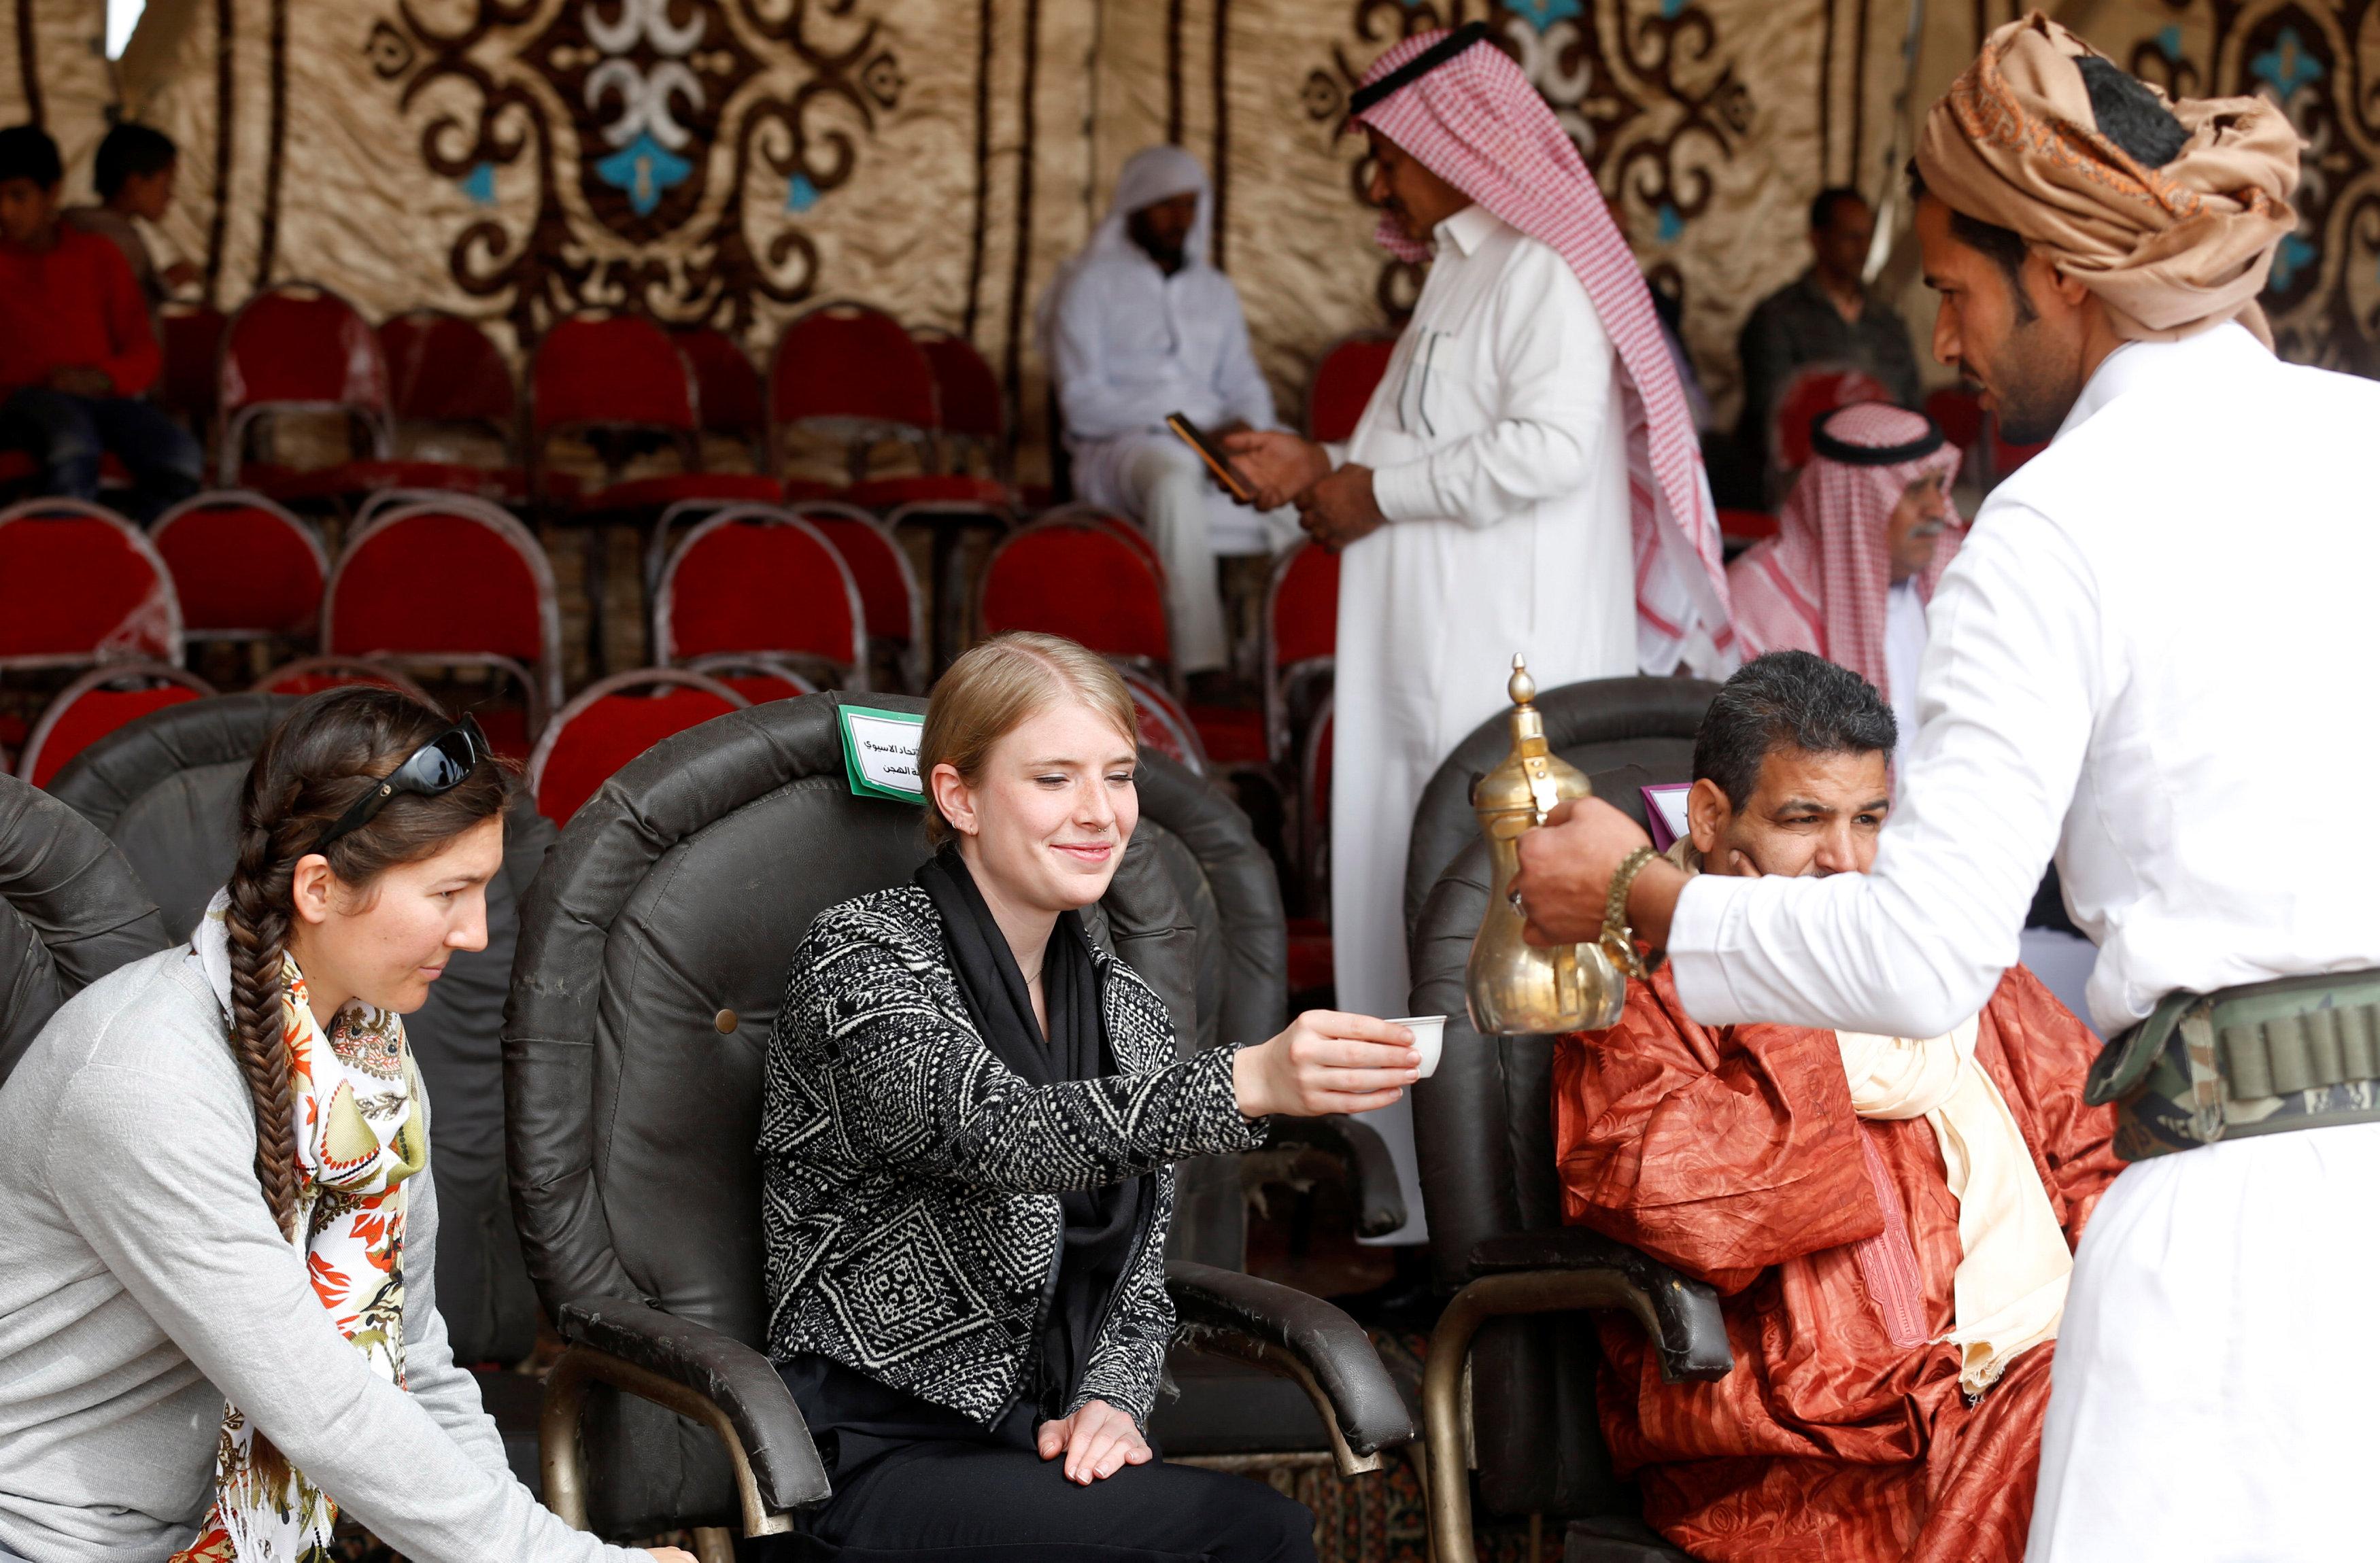 Egypt camel racers hope desert sport will spread to fresh pastures